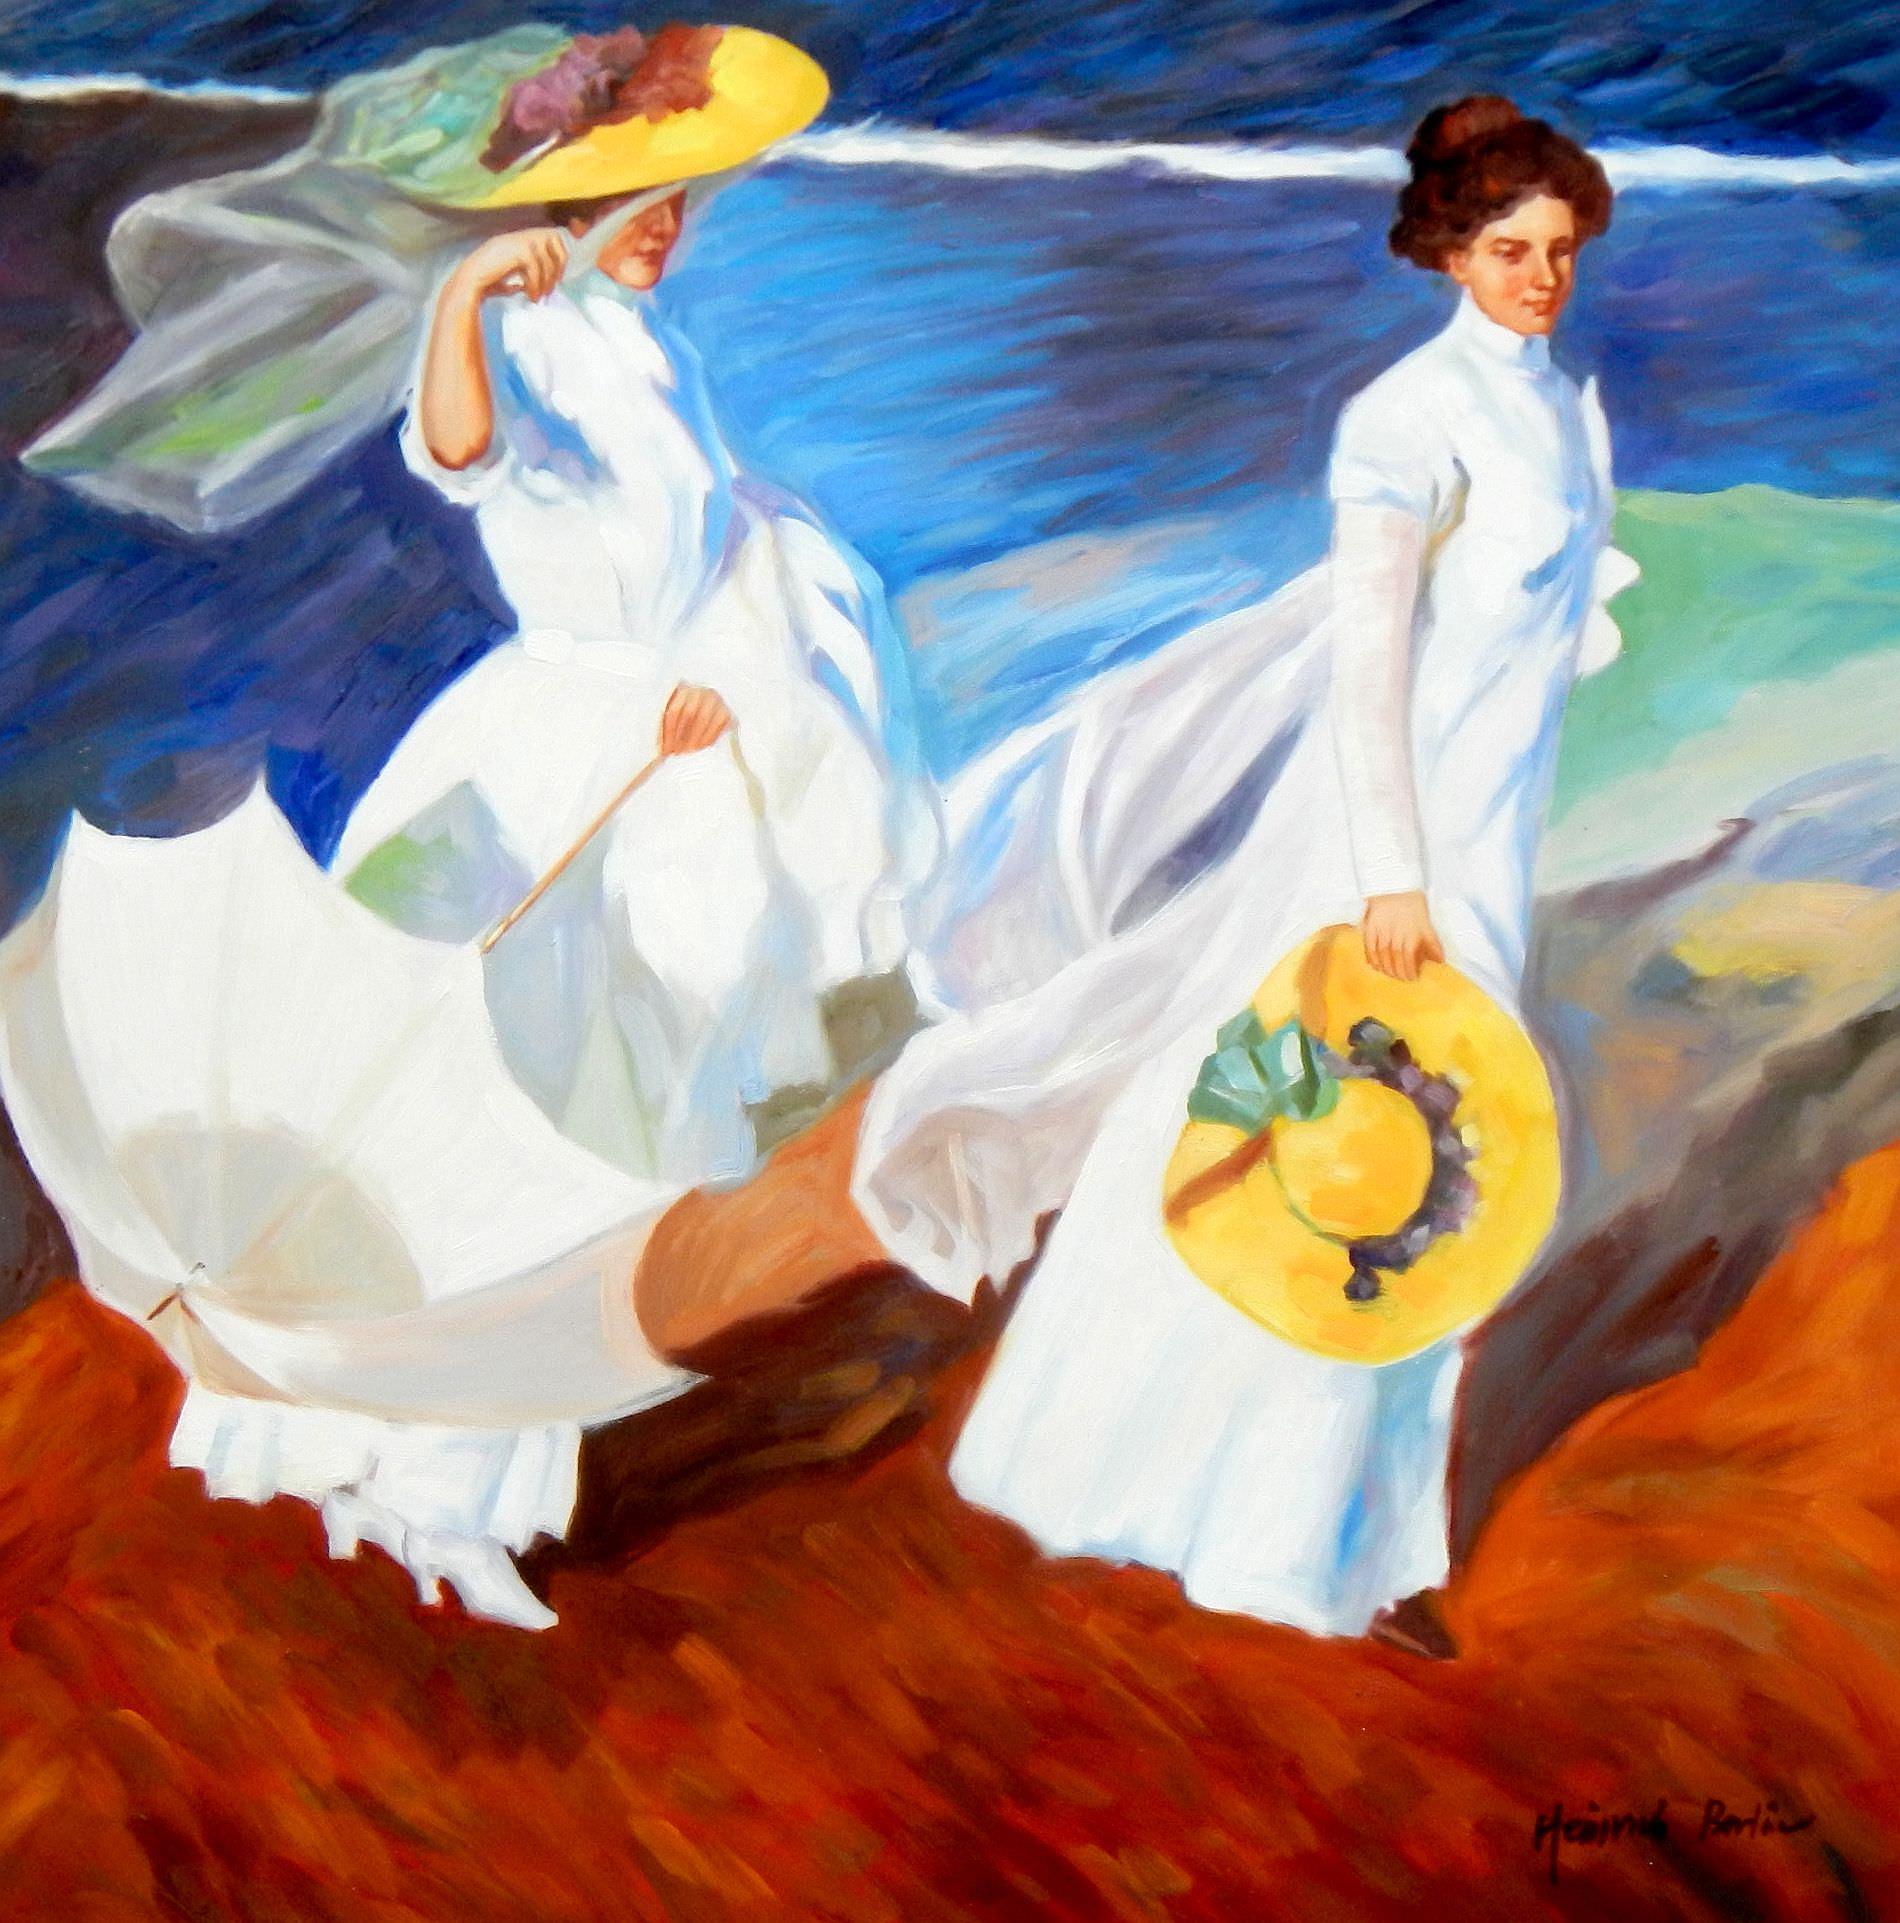 Joaquín Sorolla - Strandspaziergang g95256 80x80cm exquisites Gemälde